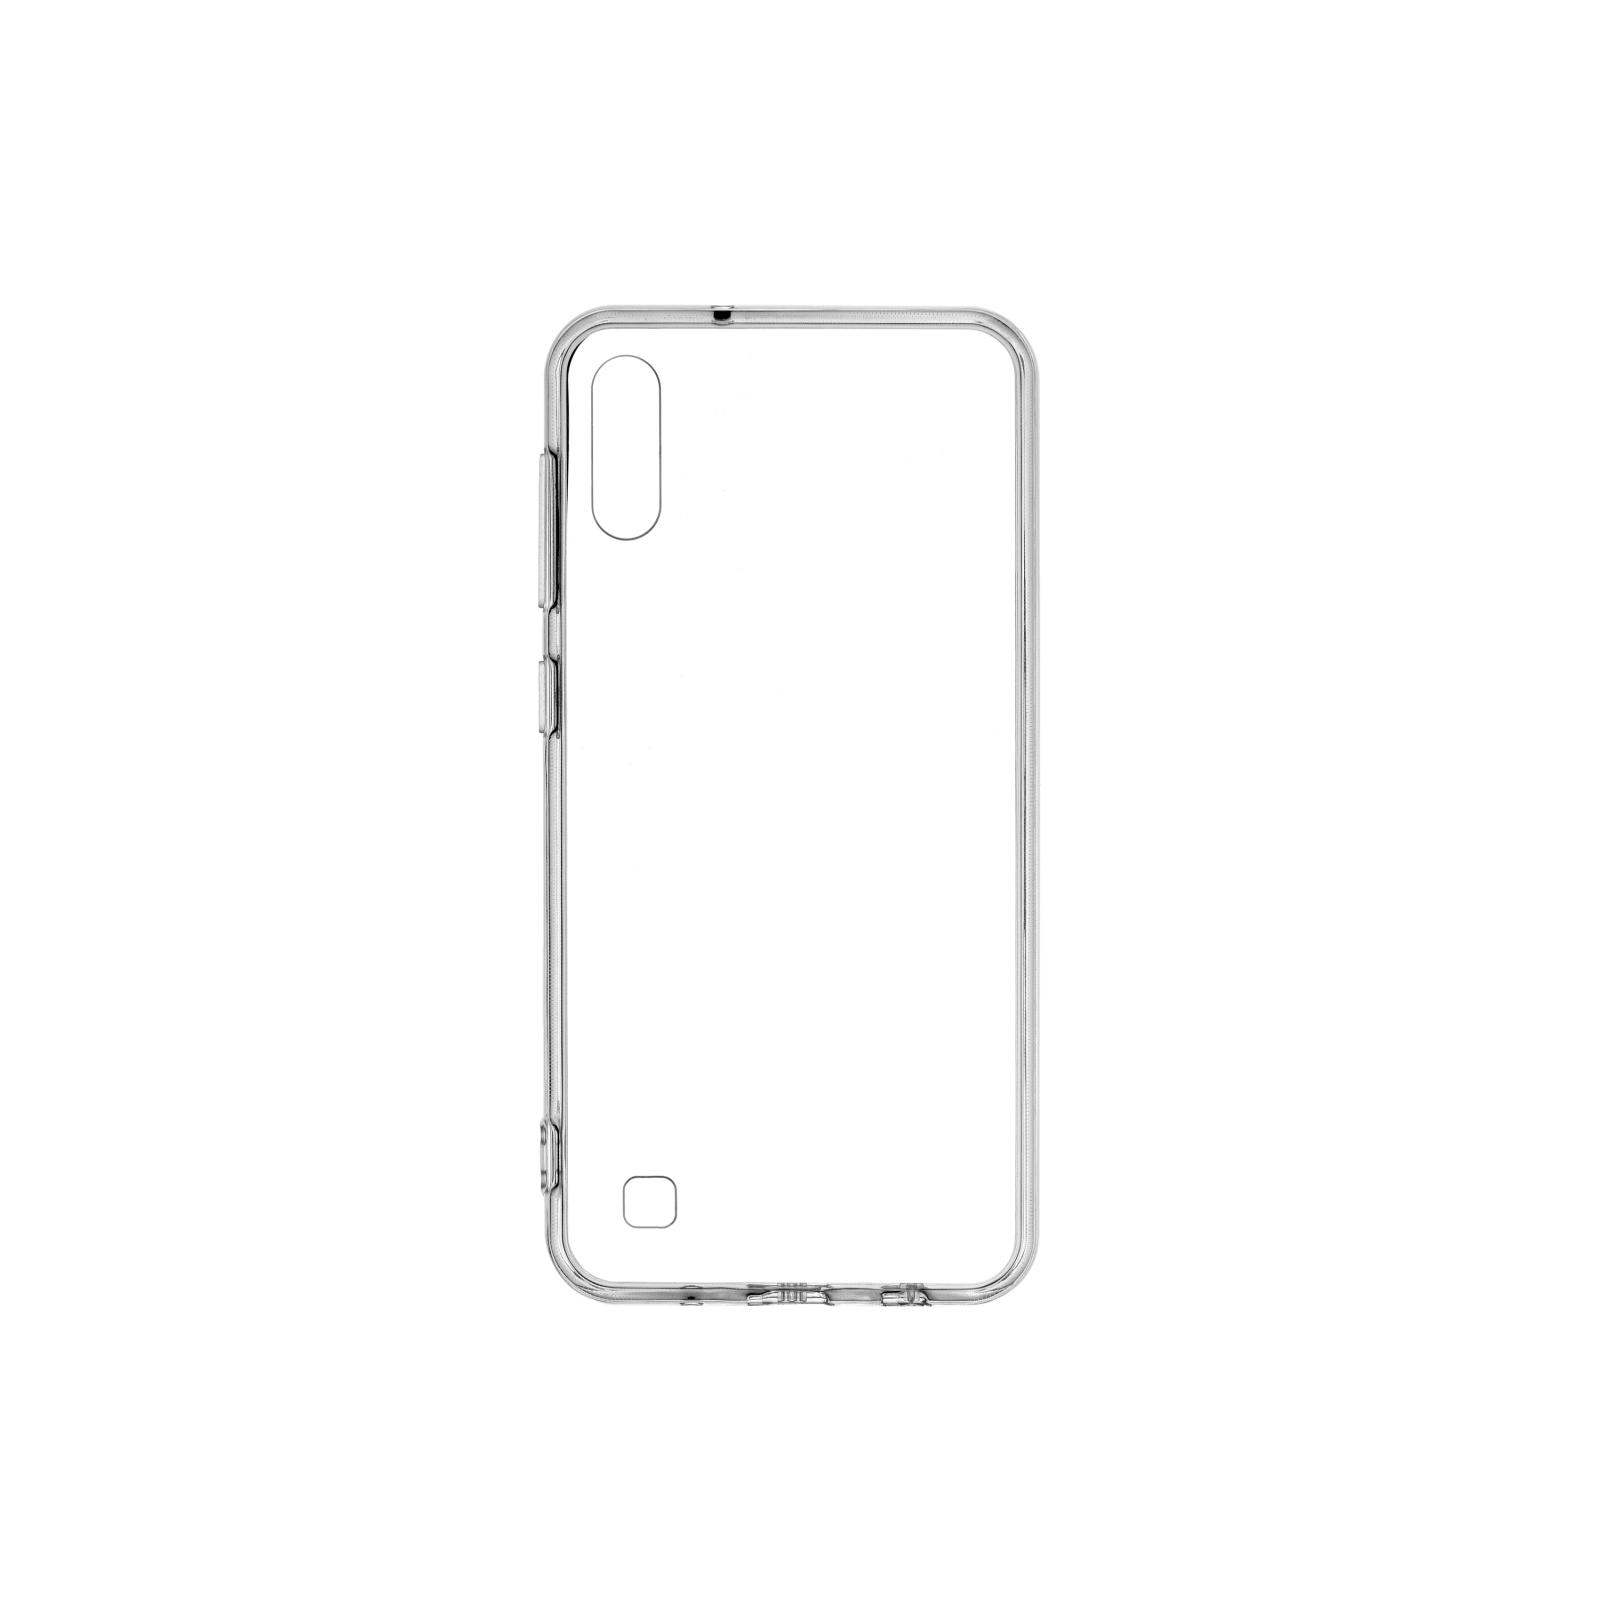 Чехол для моб. телефона 2E Galaxy A10S (A107), Hybrid, Transparent (2E-G-A10S-AOHB-TR)